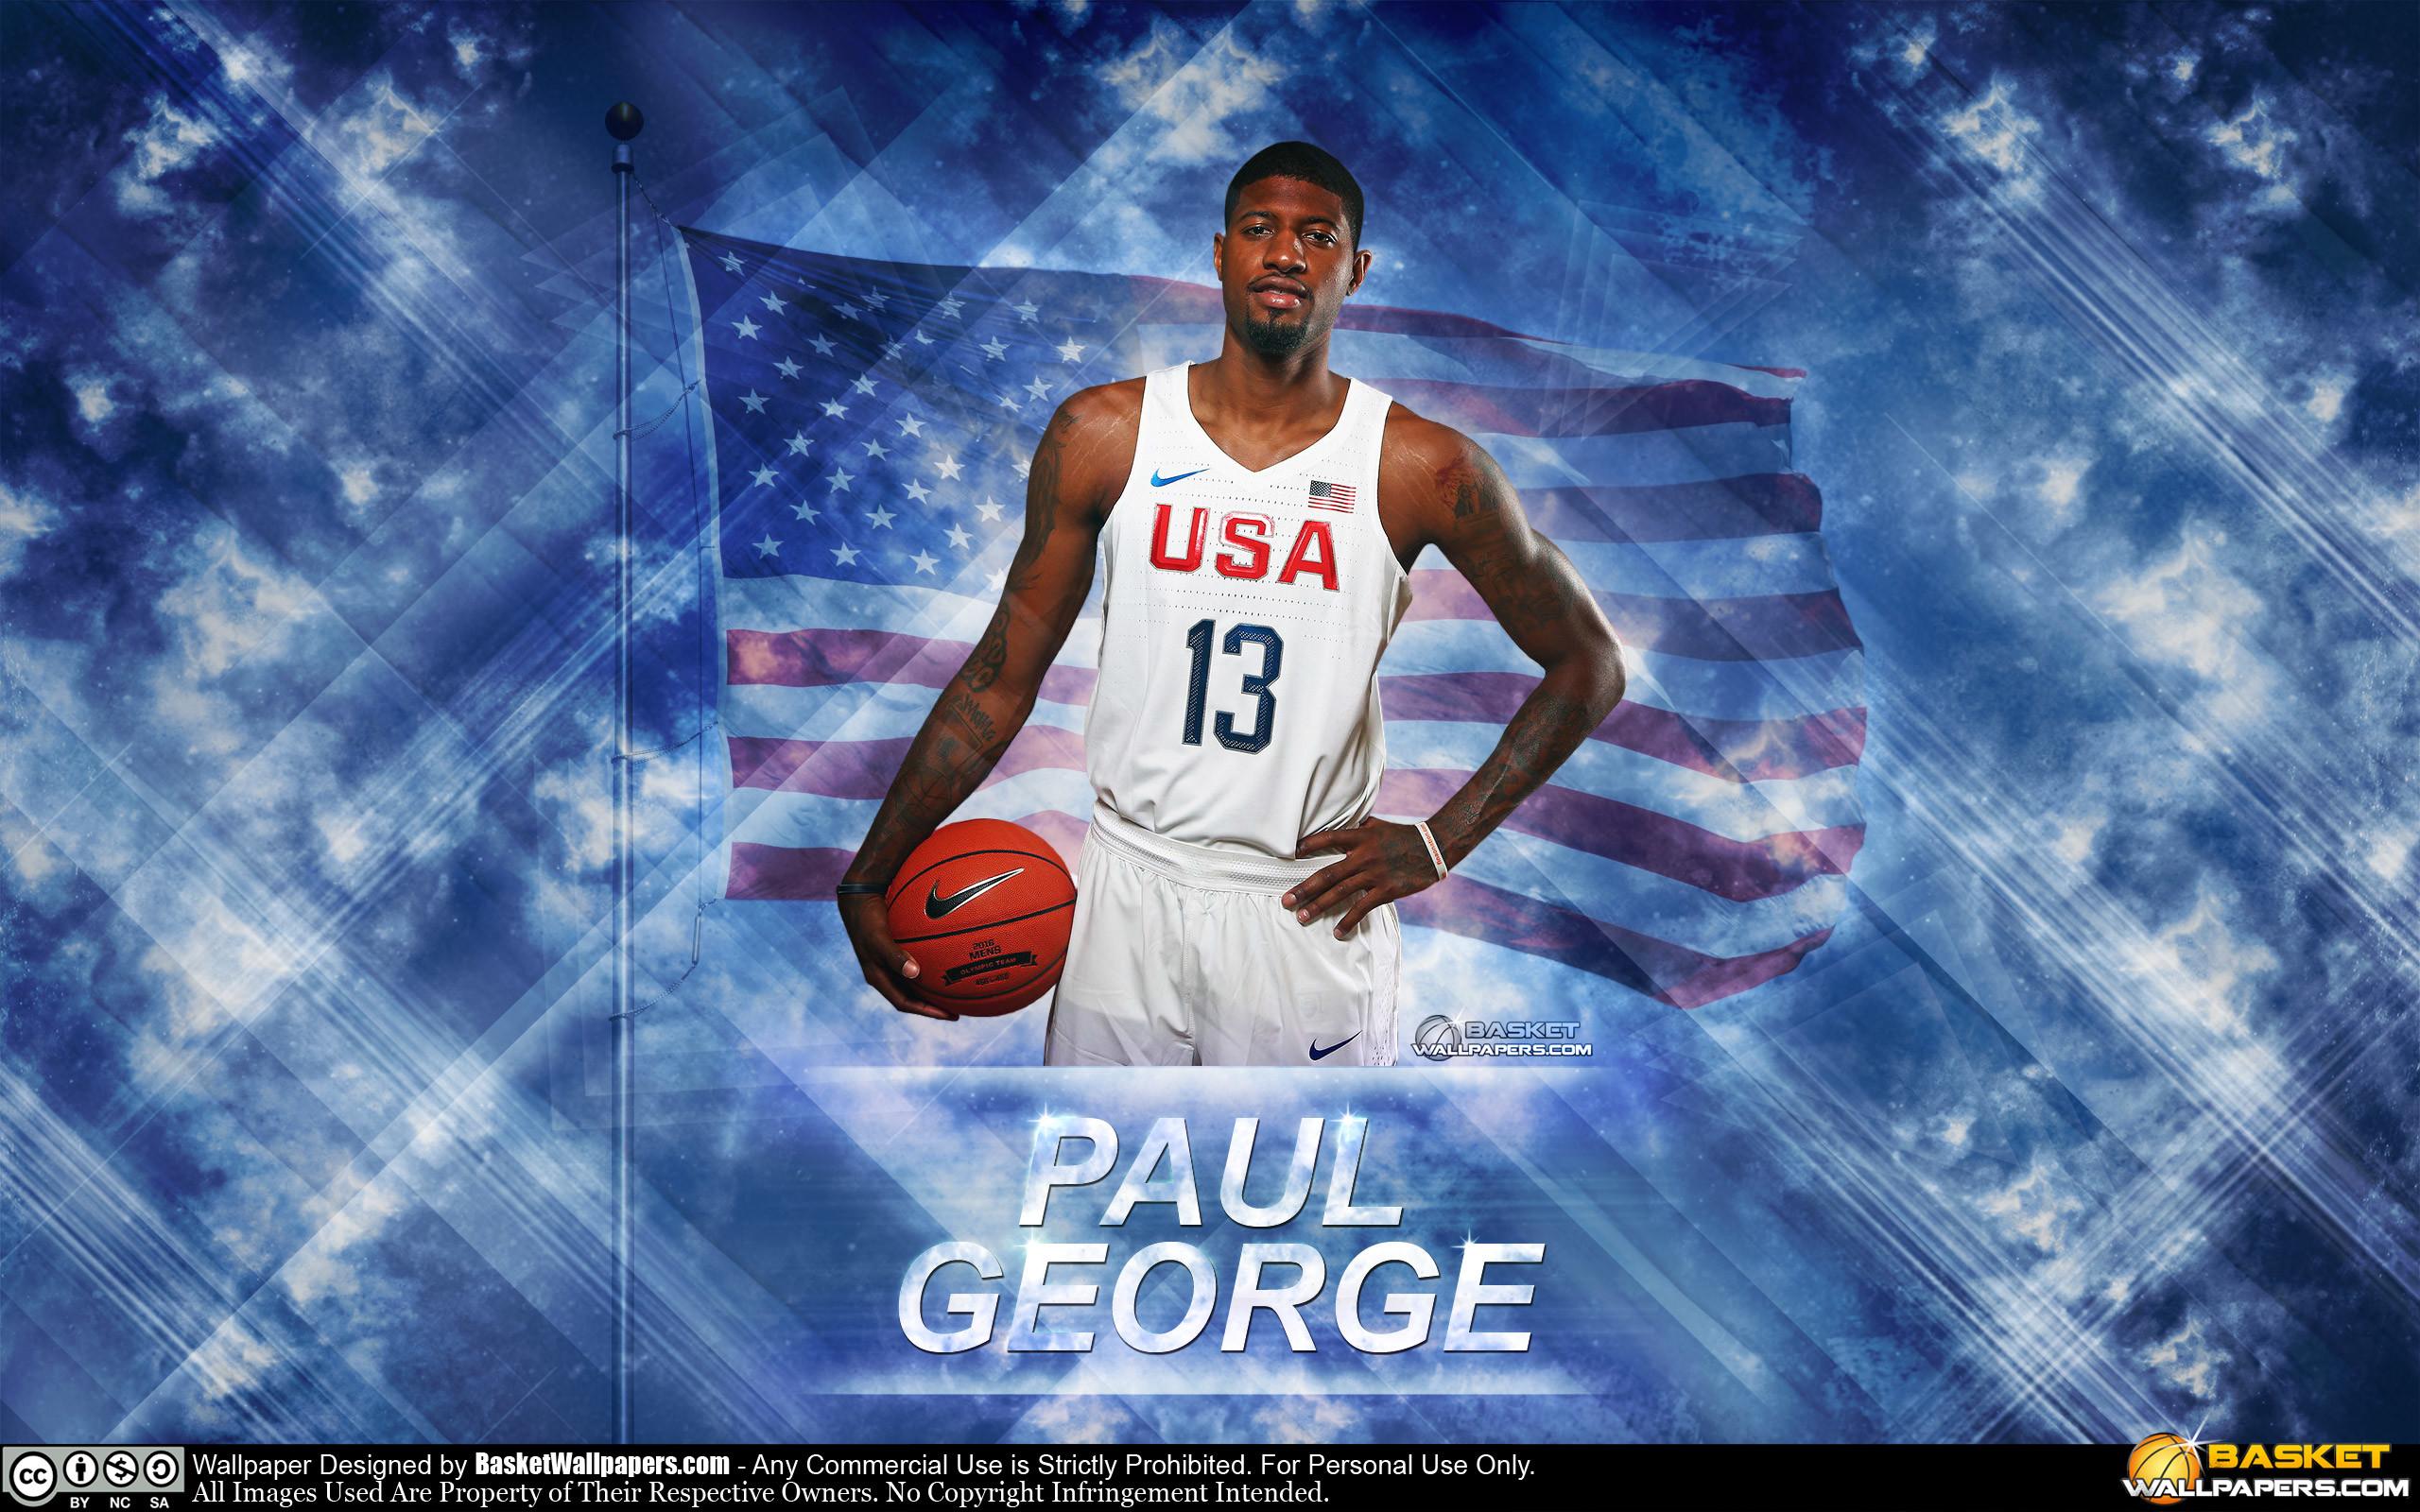 Paul George USA 2016 Olympics Wallpaper